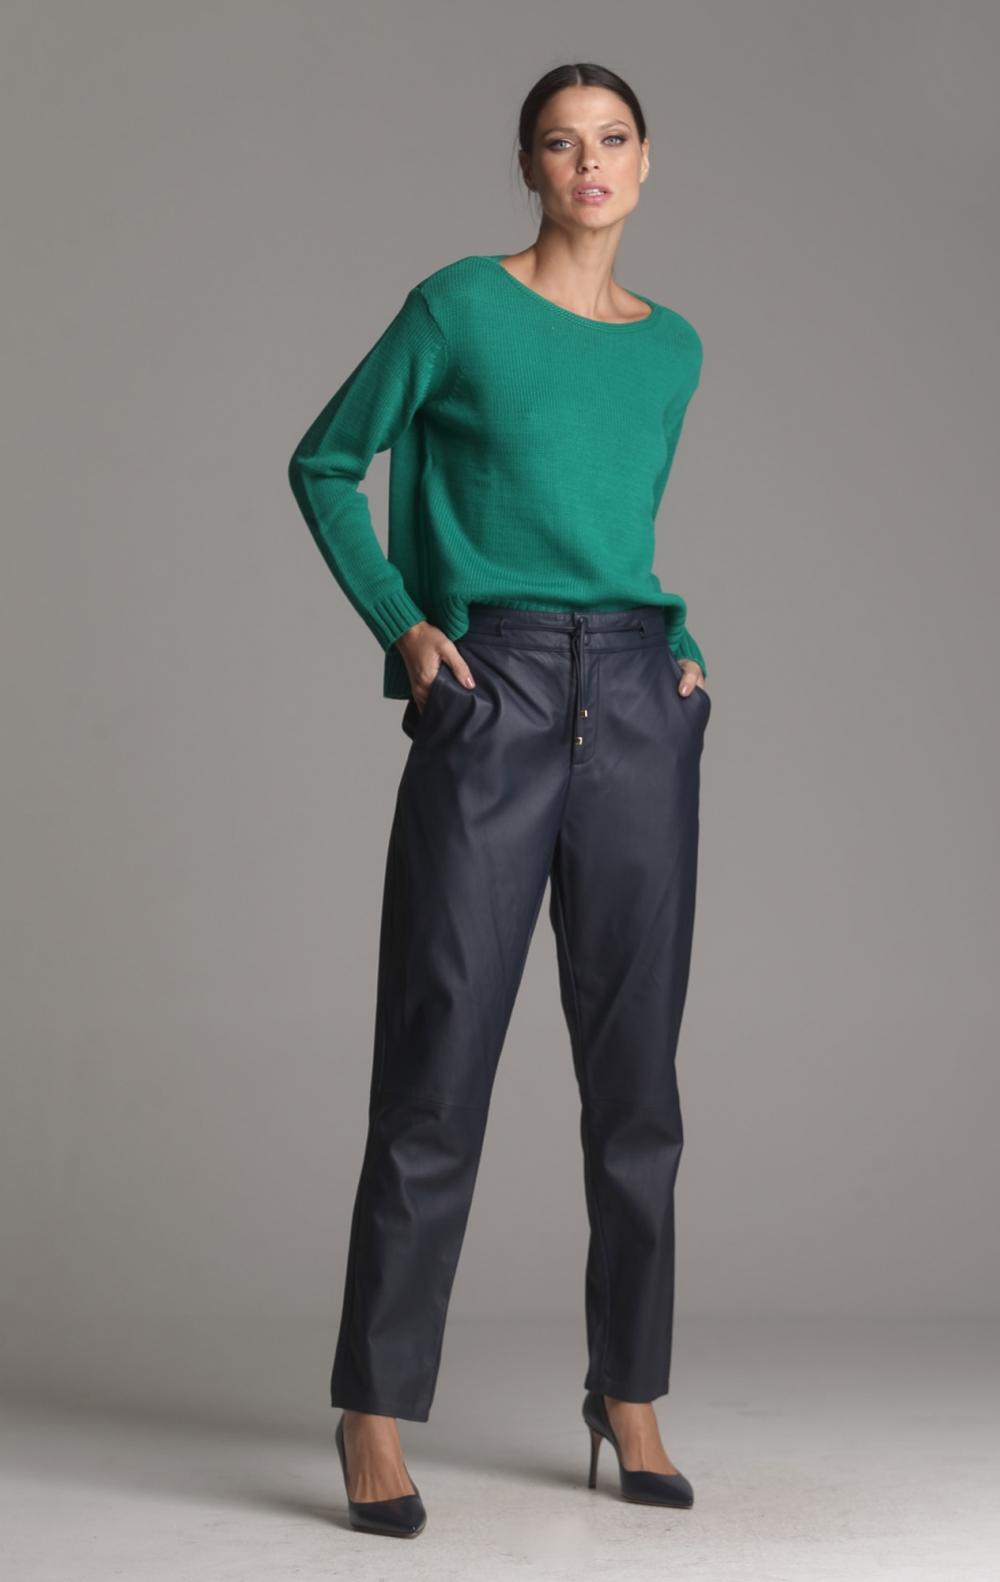 Blusa Tricot Tania Verde  - Foto 1